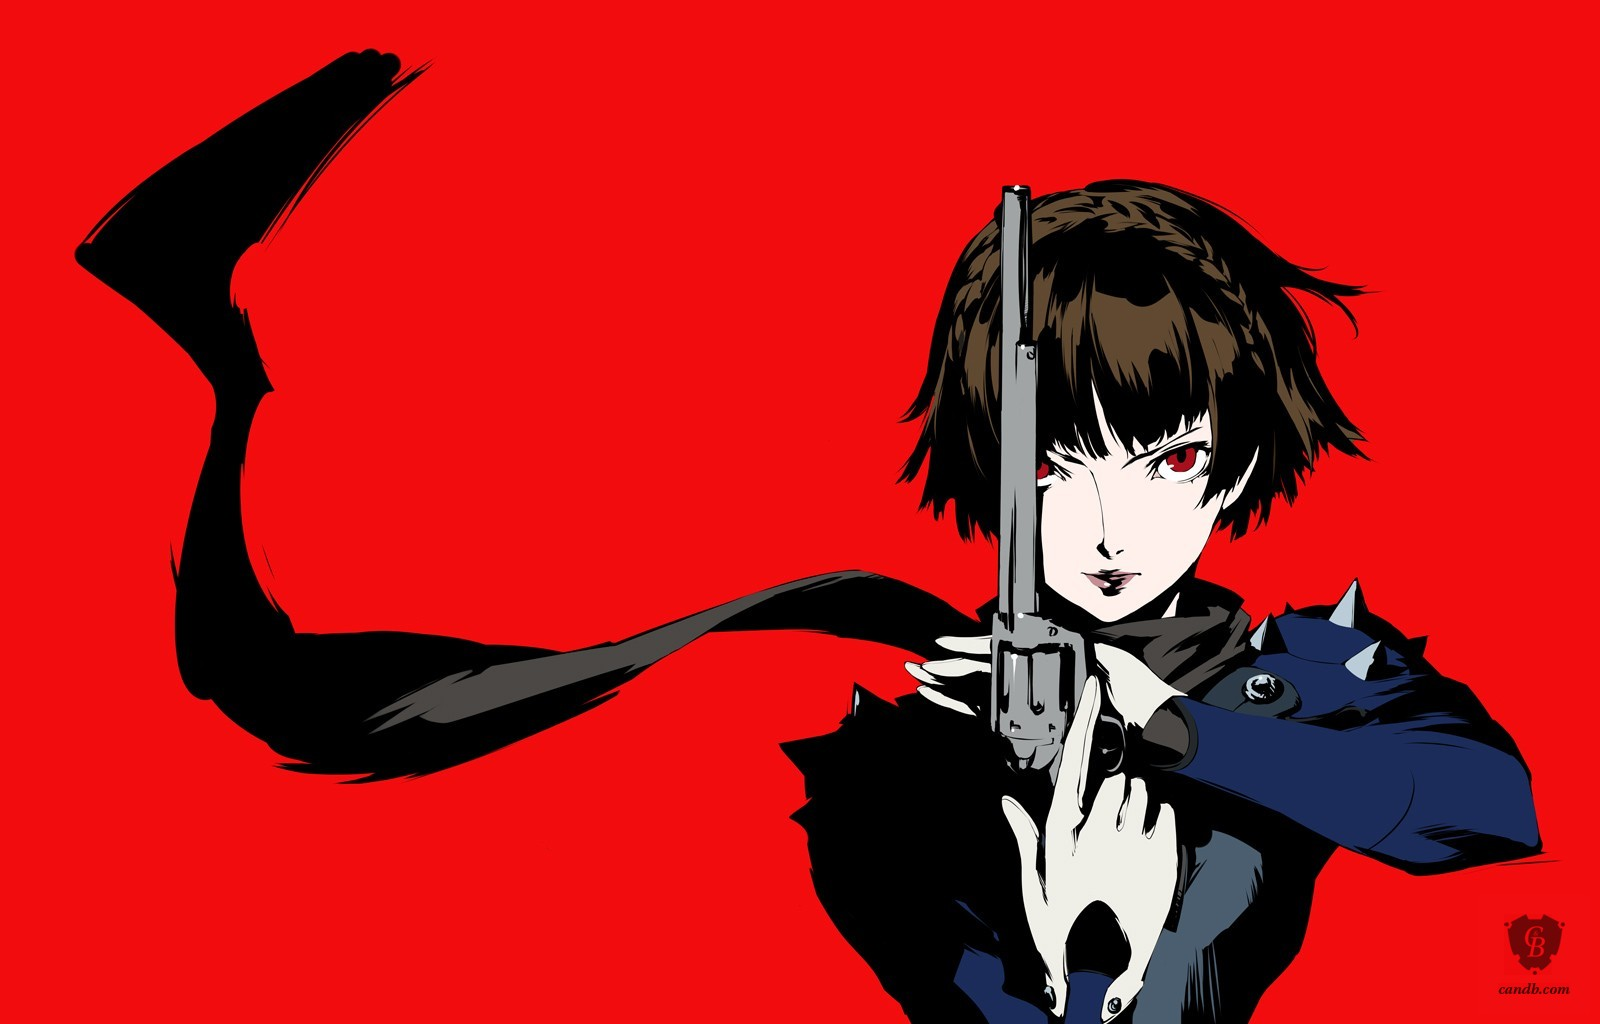 Artwork Makoto - Persona 5 Atlus